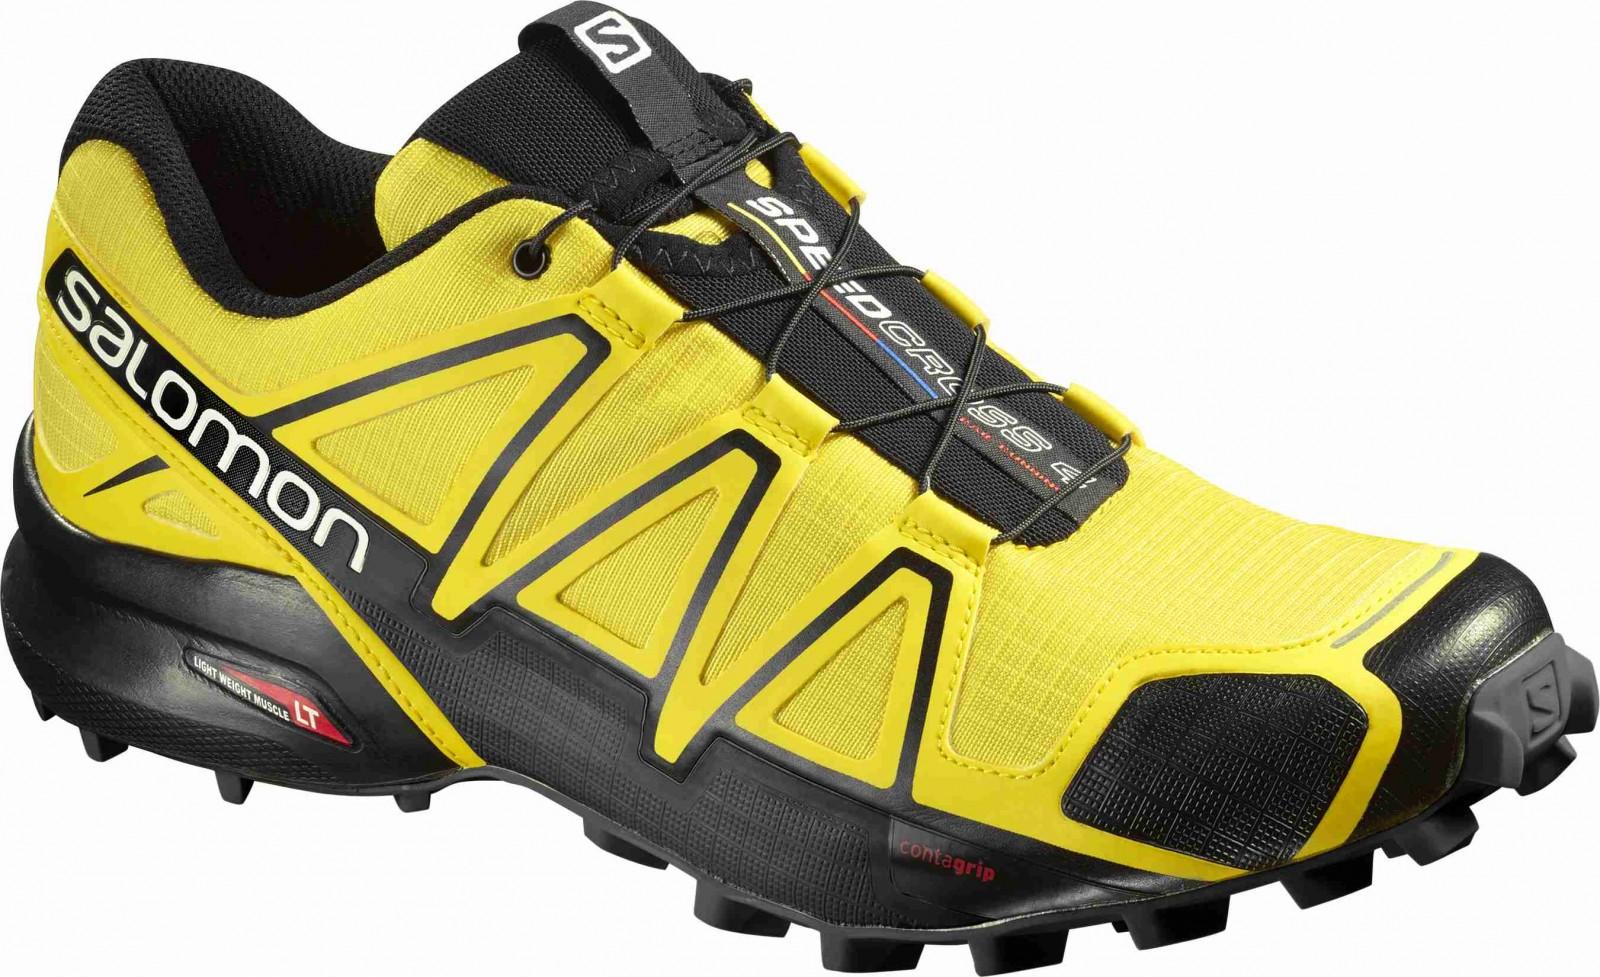 0a6c949c69 Pánské běžecké boty Salomon SPEEDCROSS 4 CORONA YELLOW YE